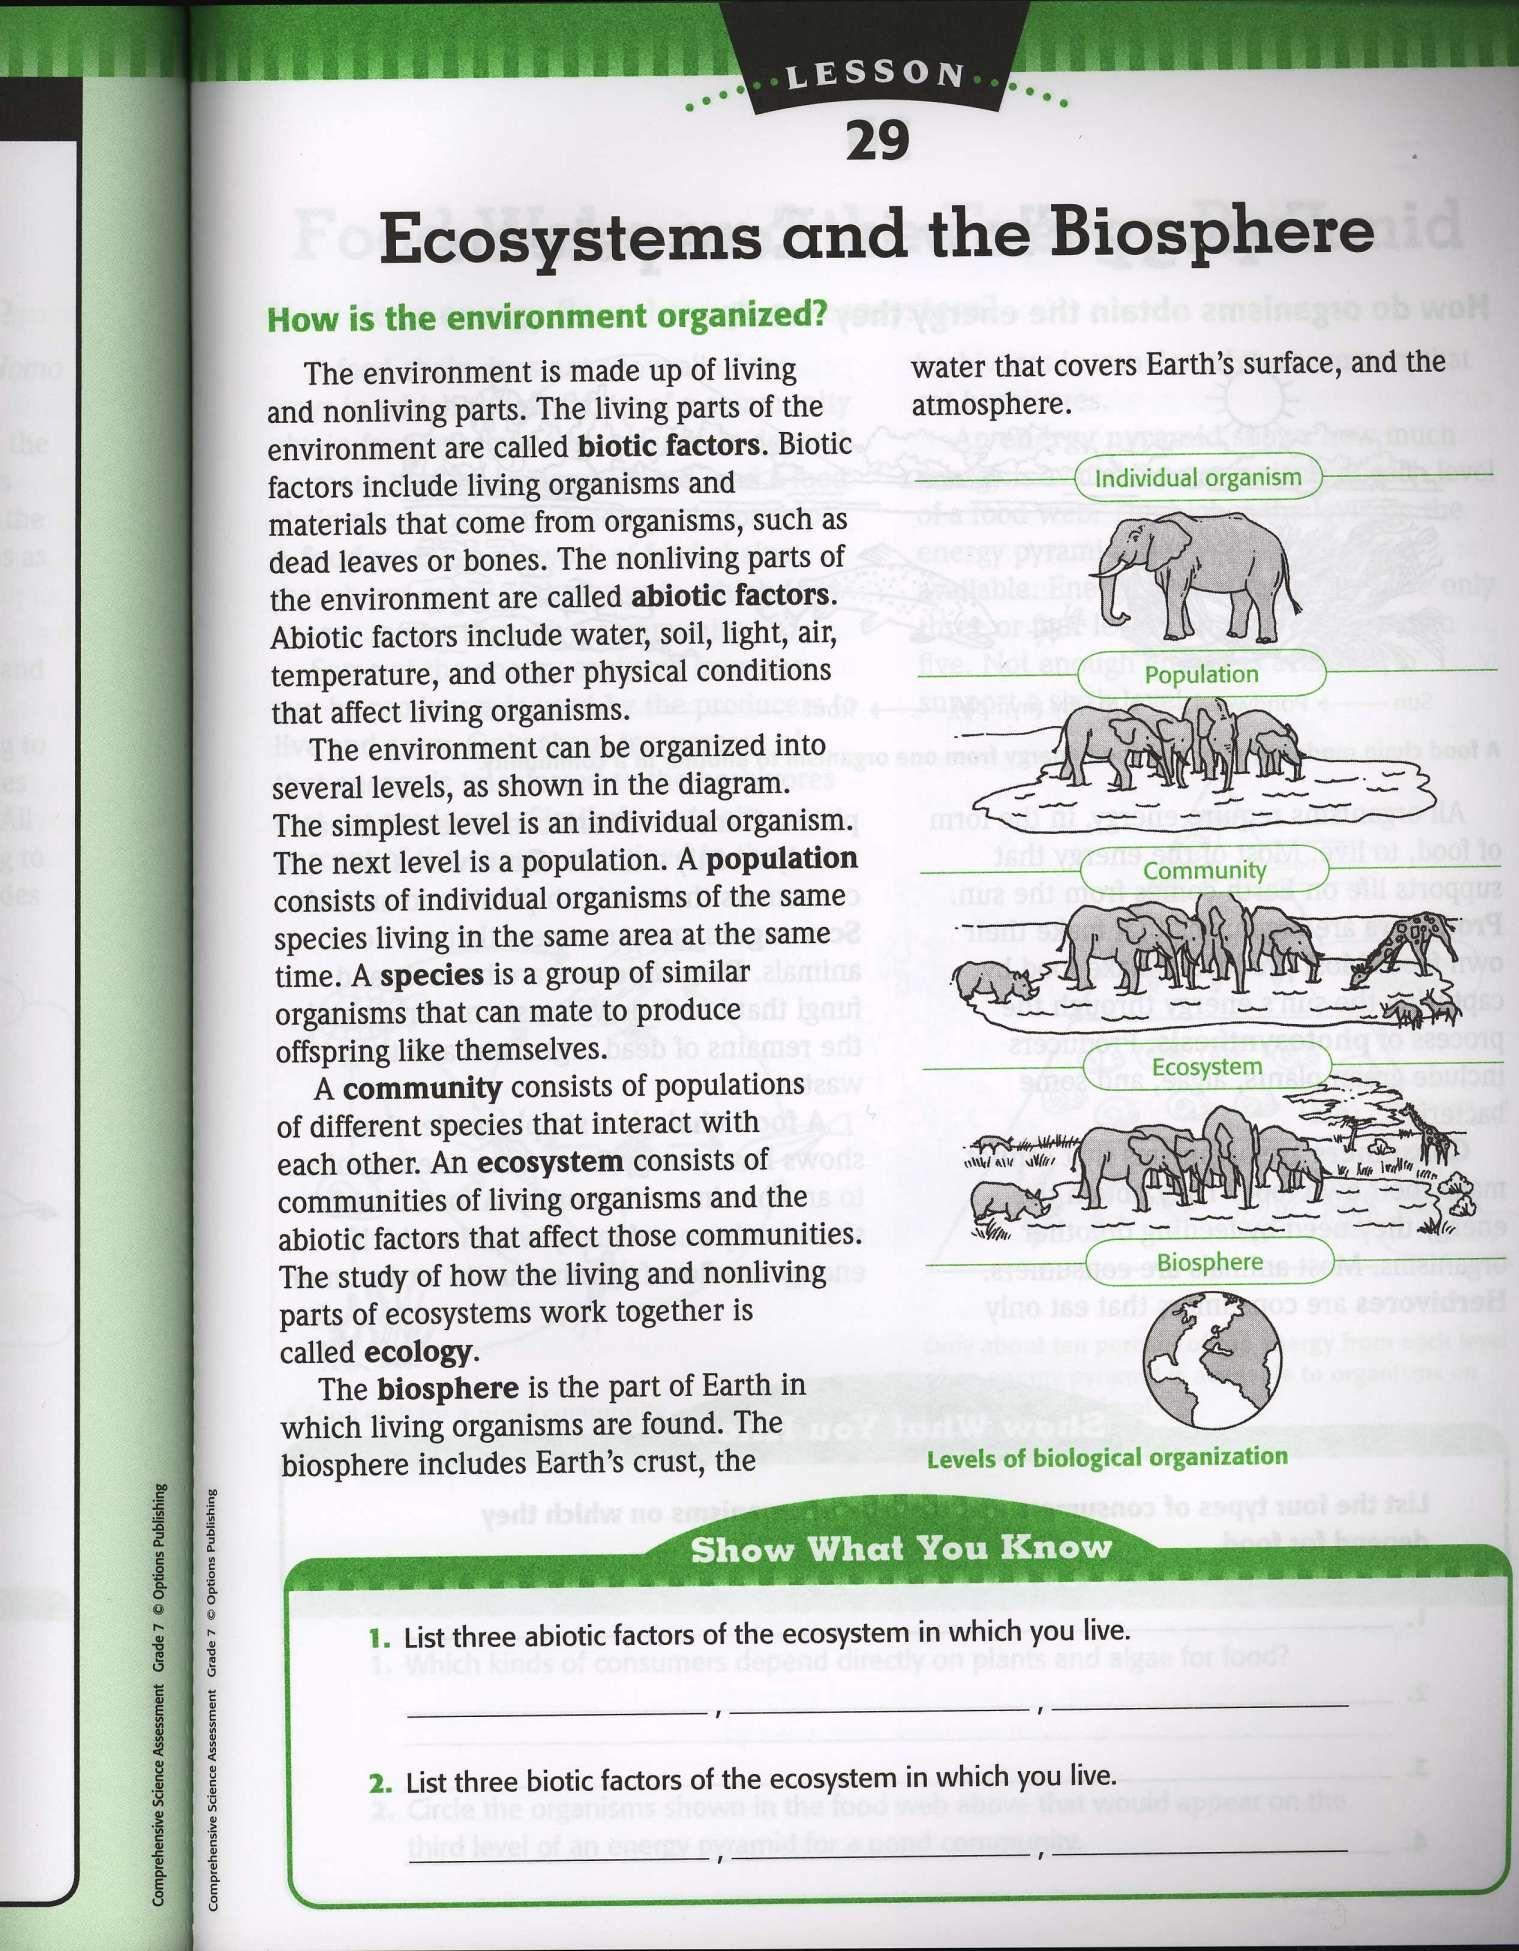 11 Ecological Levels Of Organization Science Worksheet Science Printable Sheets Com In 2020 Biology Worksheet Reading Worksheets Worksheet Template